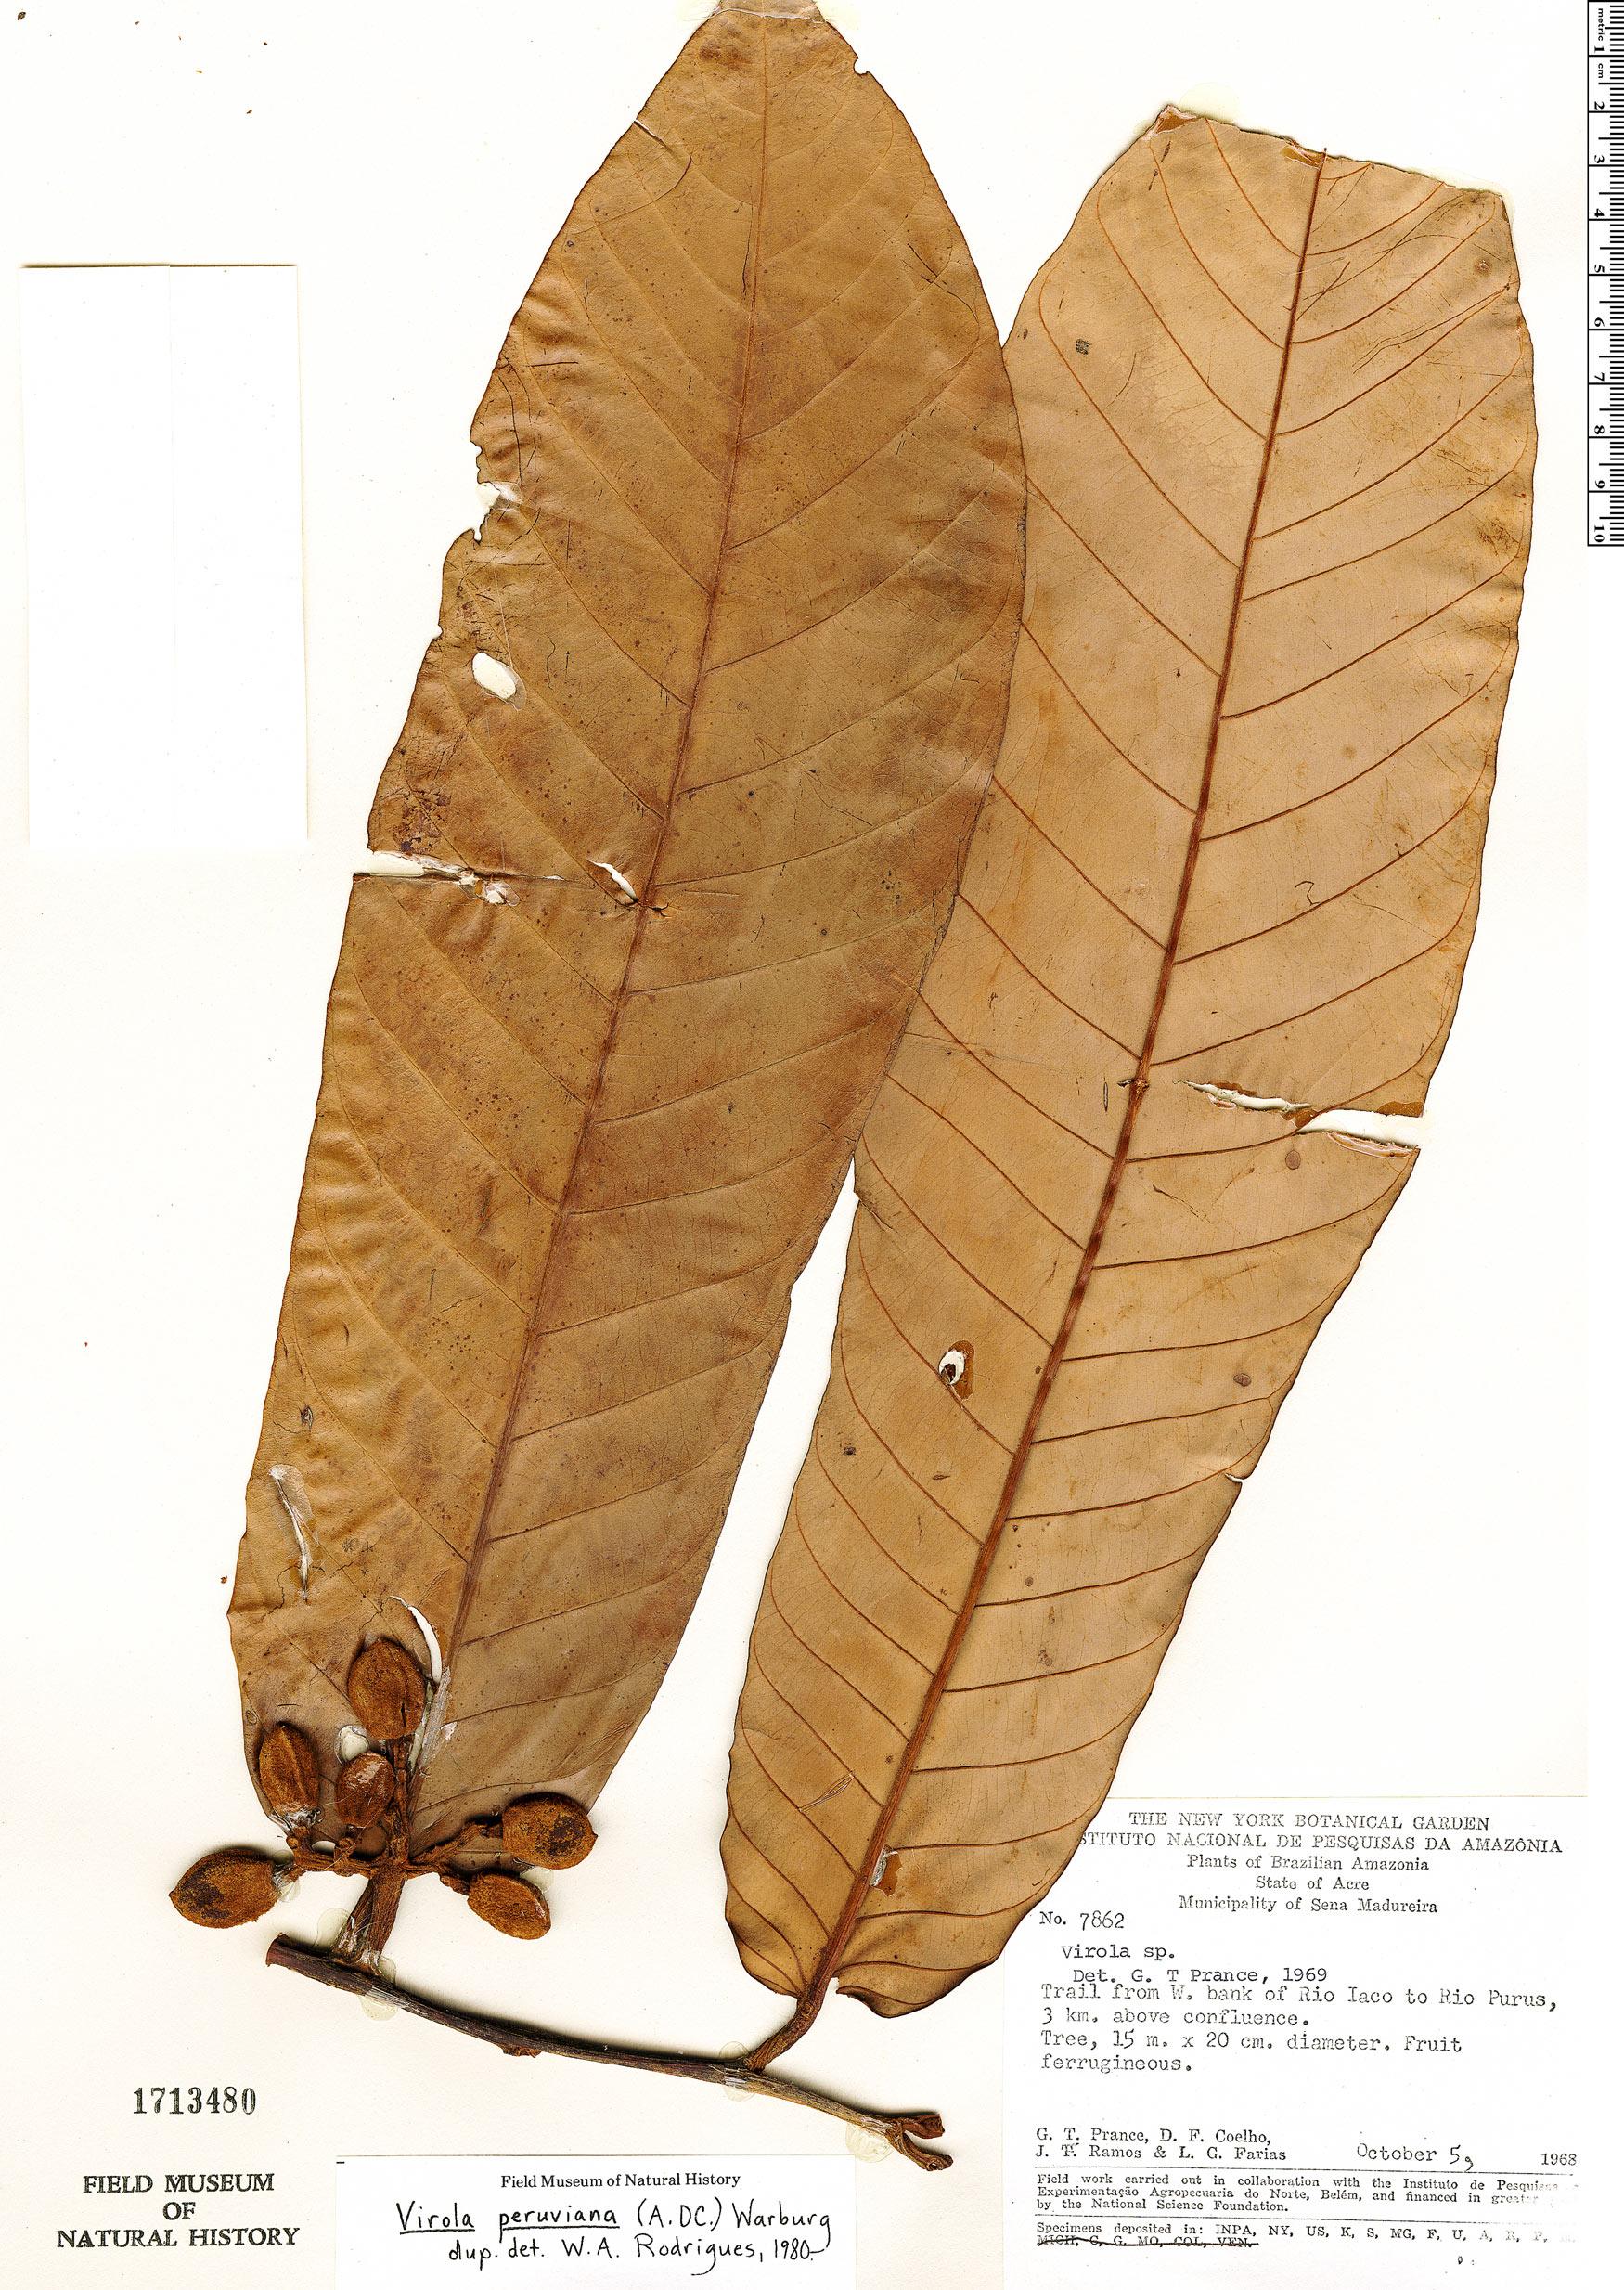 Specimen: Virola peruviana